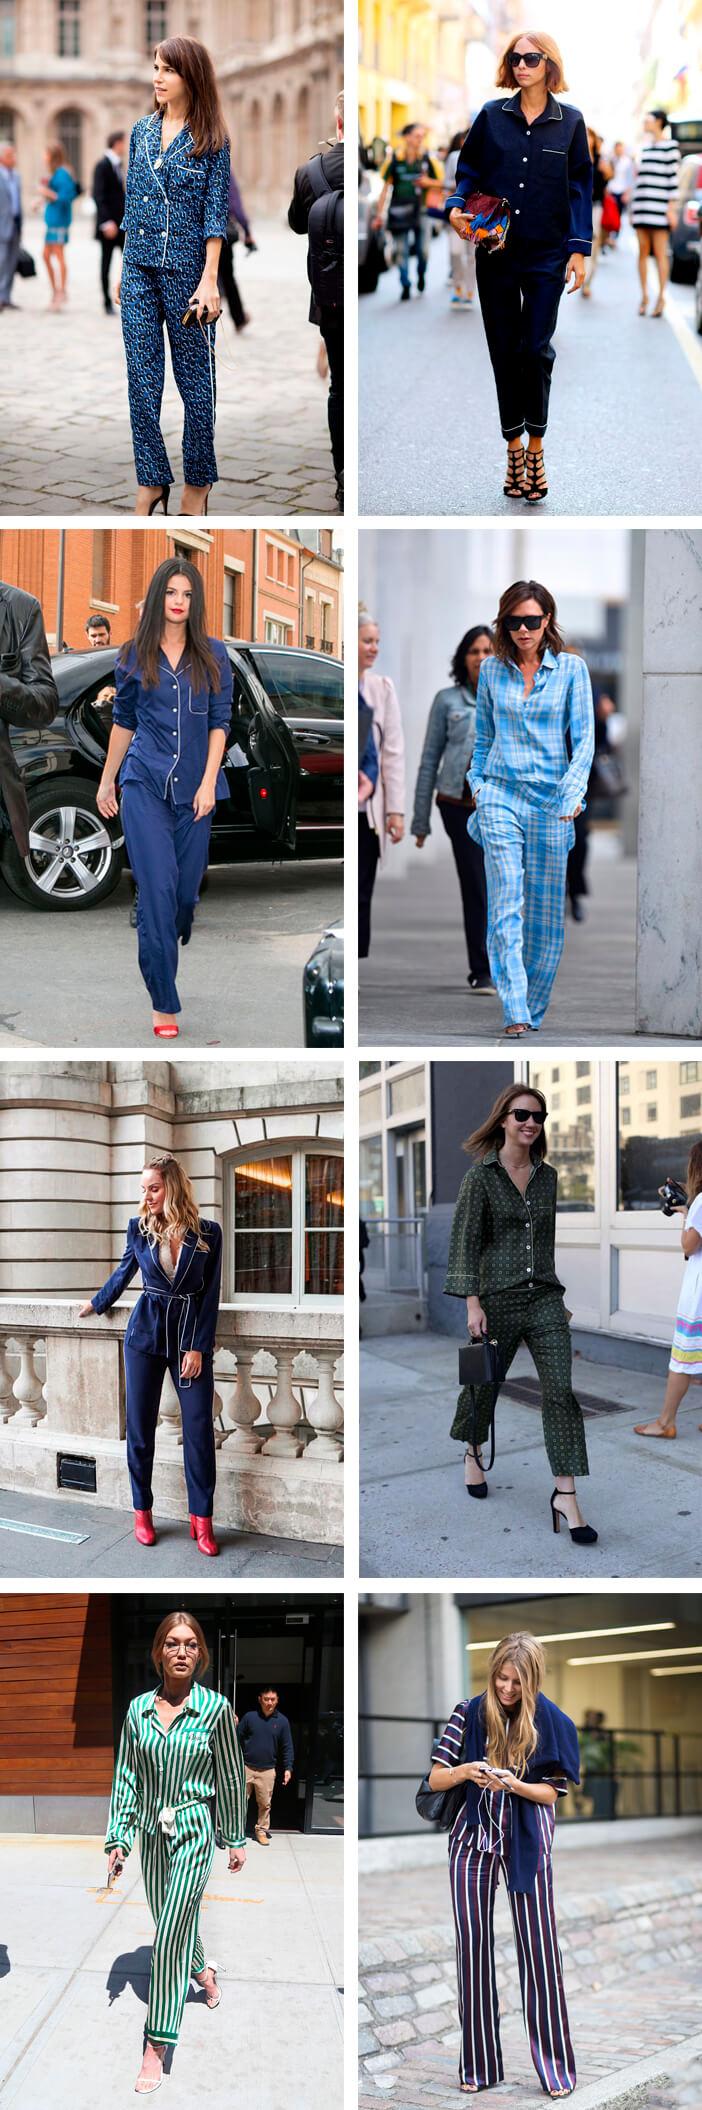 Hot or Not - Conjunto pijama